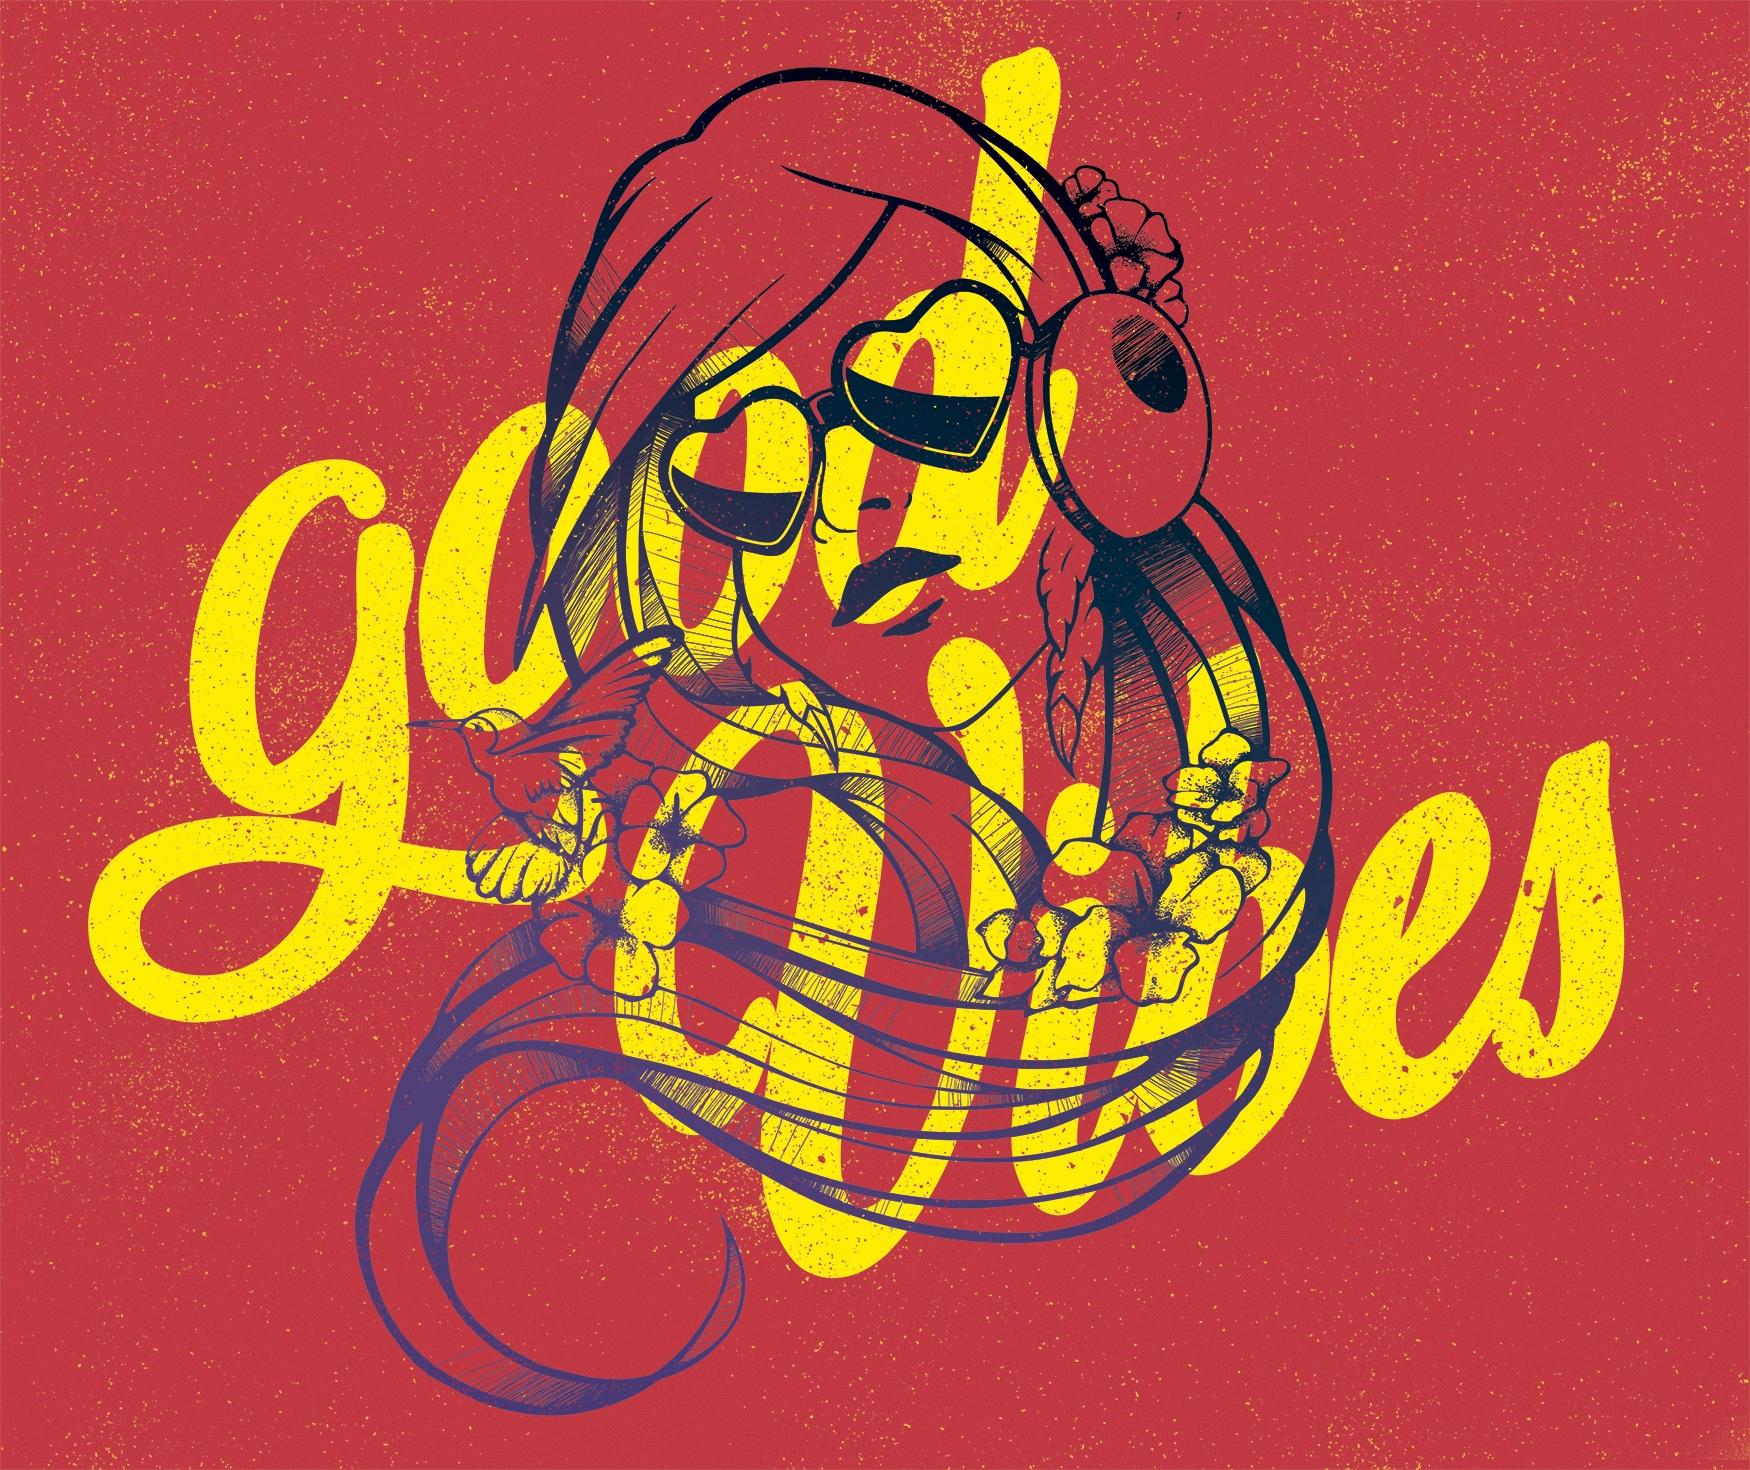 Good Vibes tshirt design - illustration - laranoia | ello